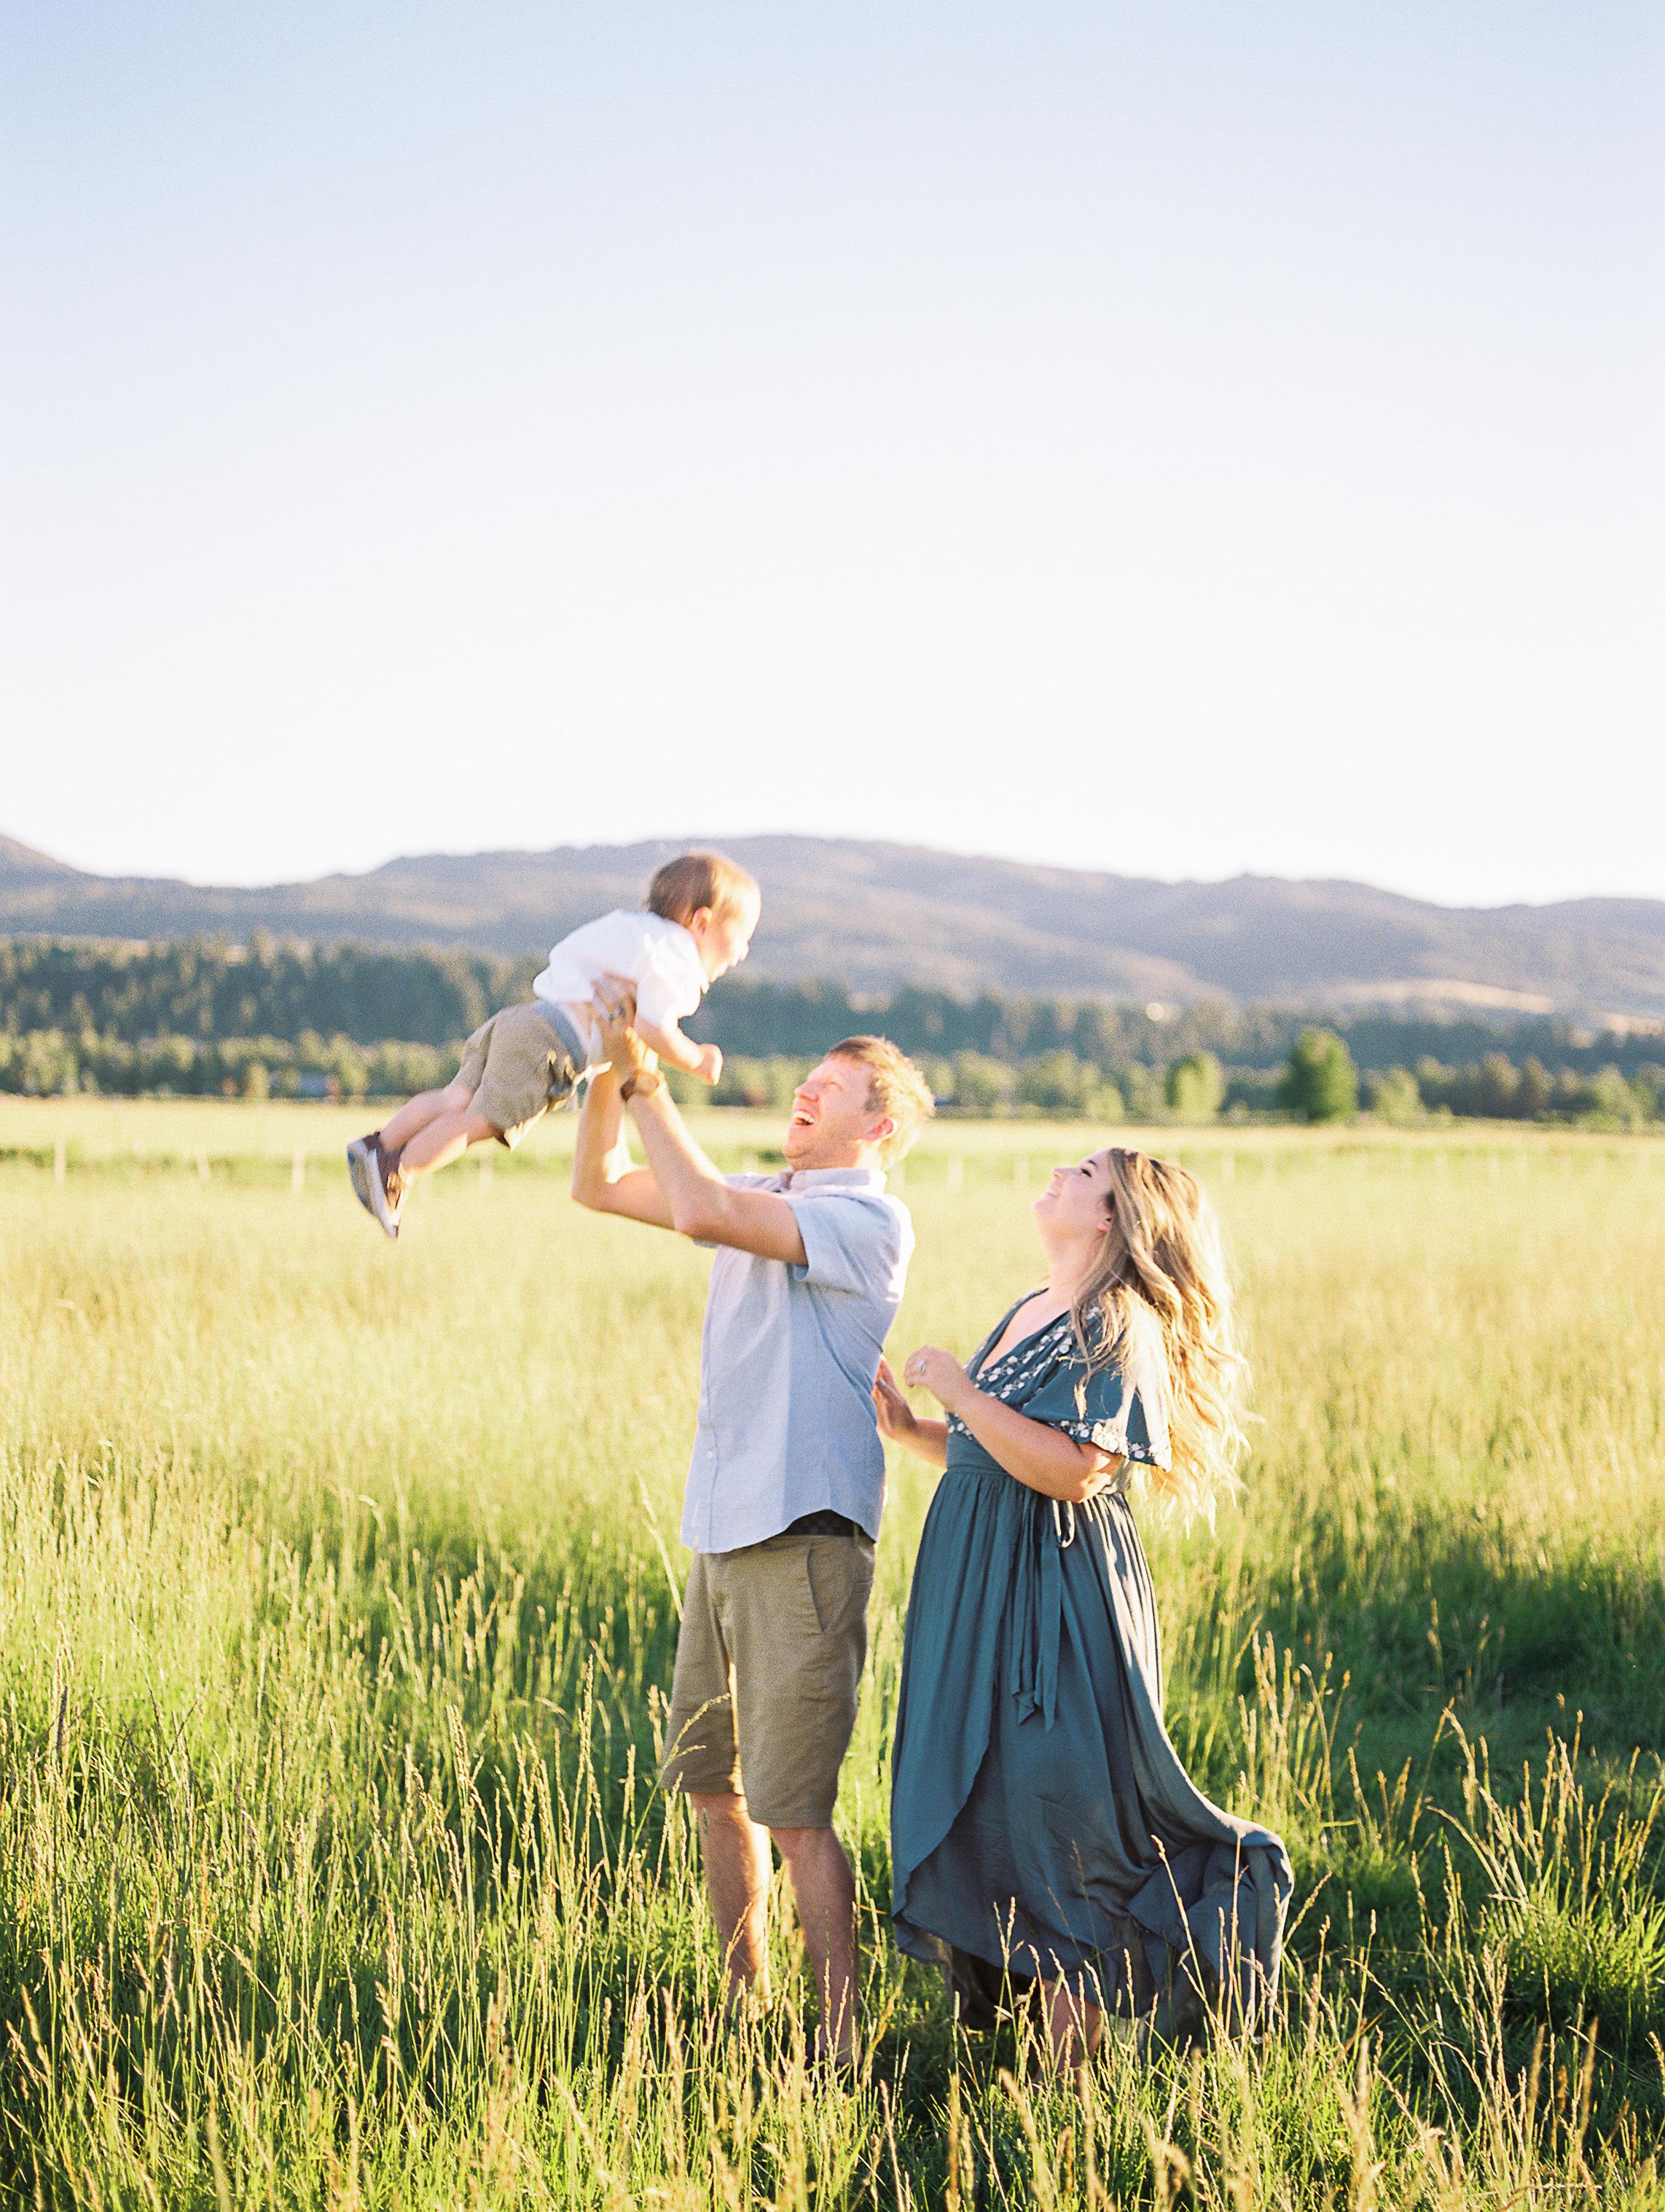 Family, Swan Valley, Film, Rainey Creek Farm, Rainey Creek Weddings, Farm life, open spaces, Idaho, Jackson Hole, Wyho boarder